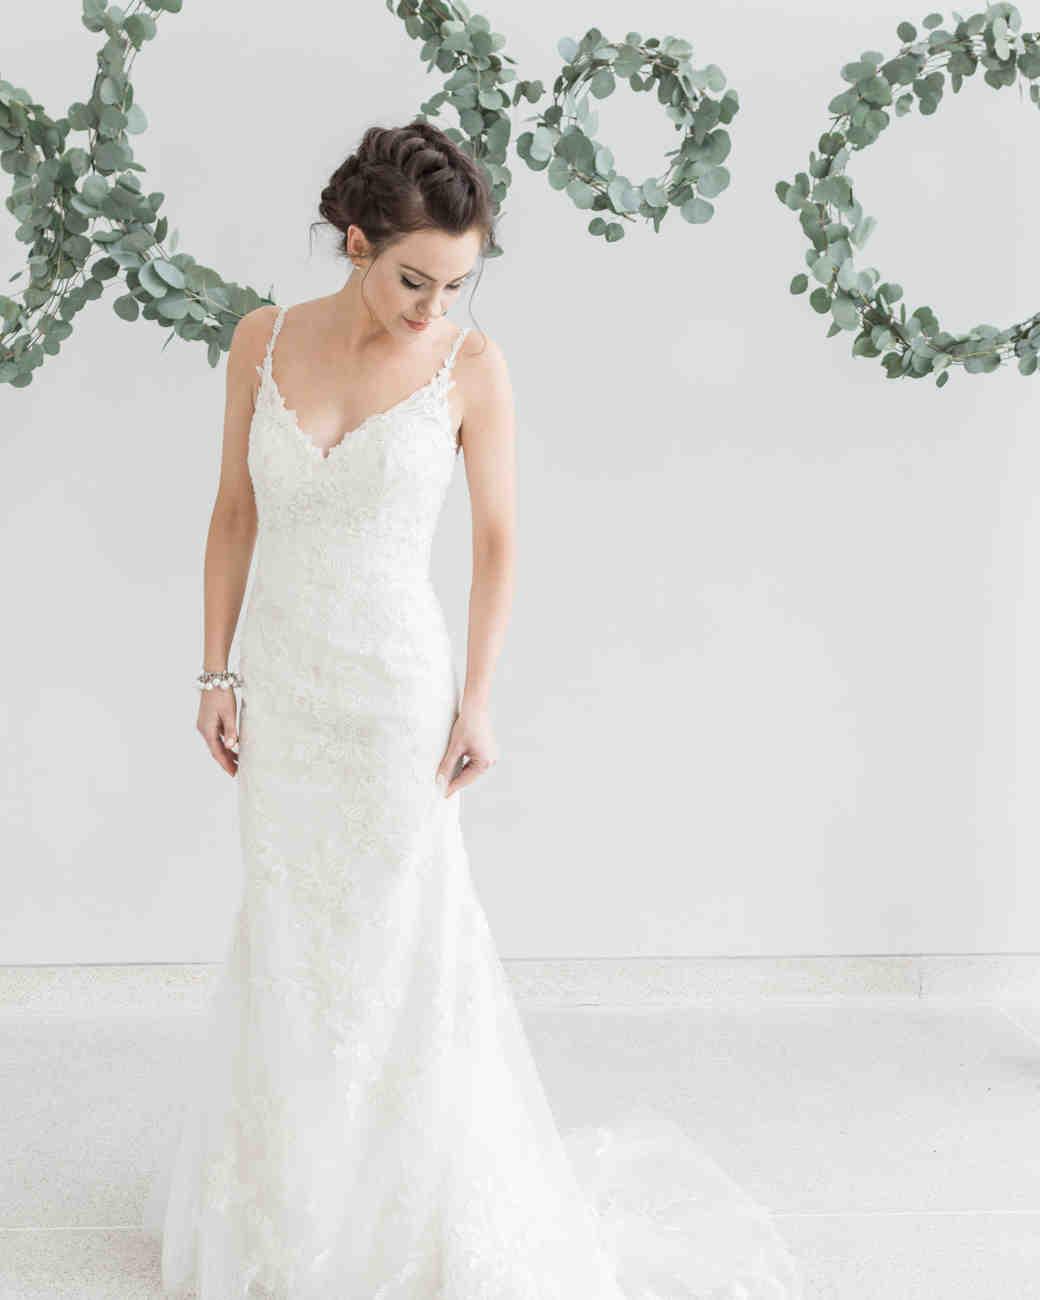 eucalyptus wedding wreaths bride pose